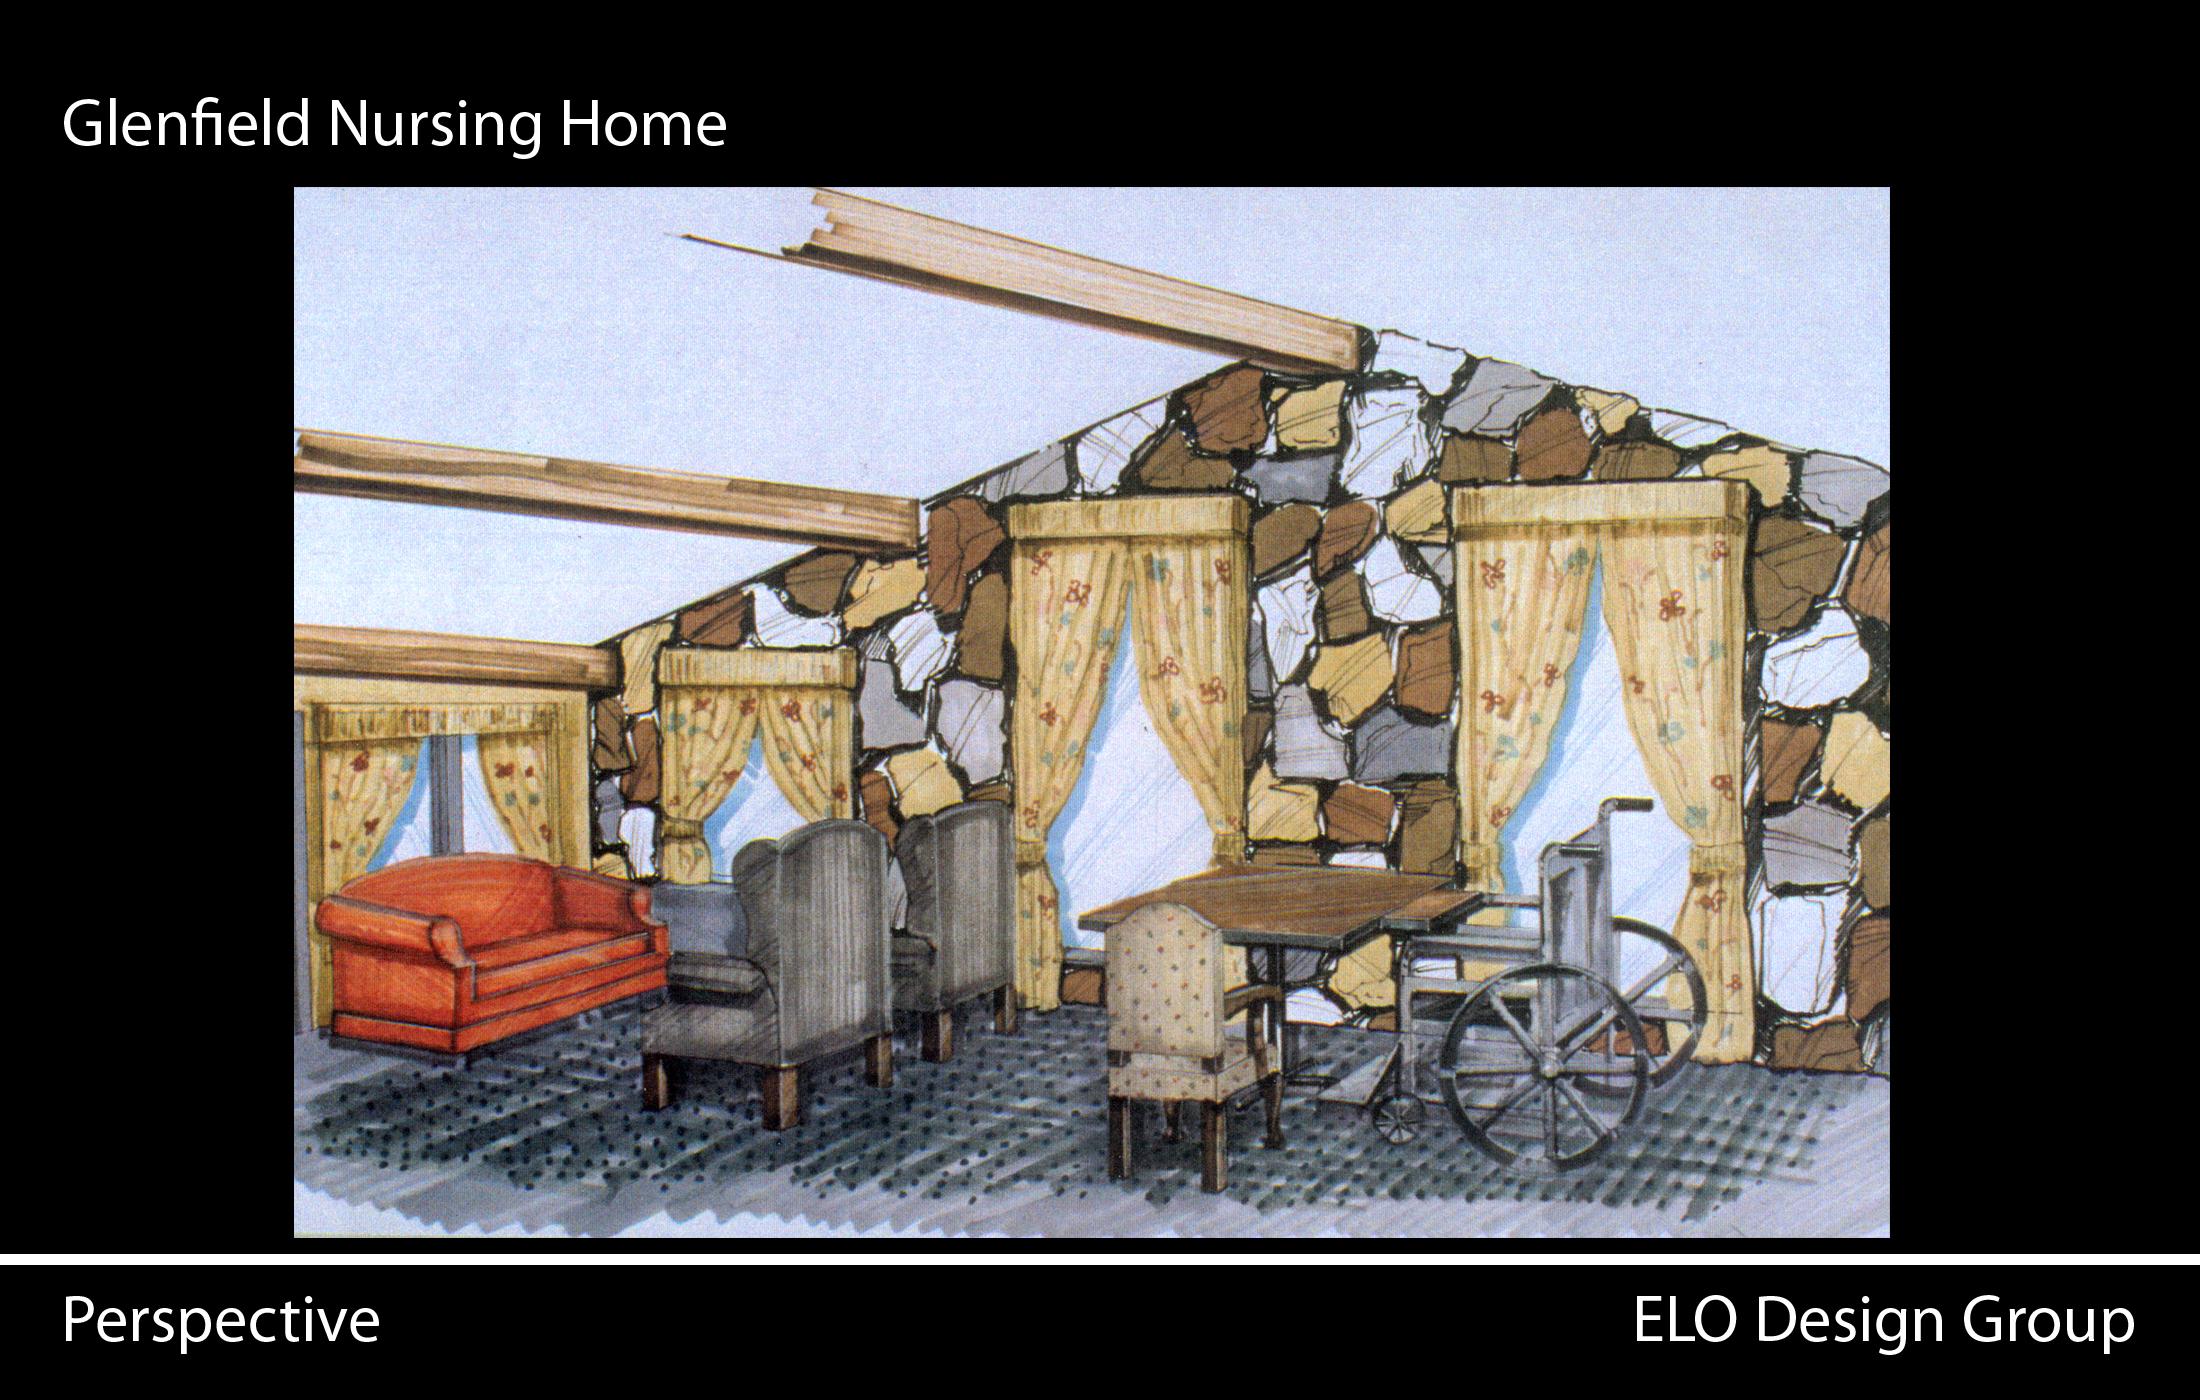 H and h home interior design - Interior Design Nursing Home Hand Drawn Renderings Of Interior Spaces H